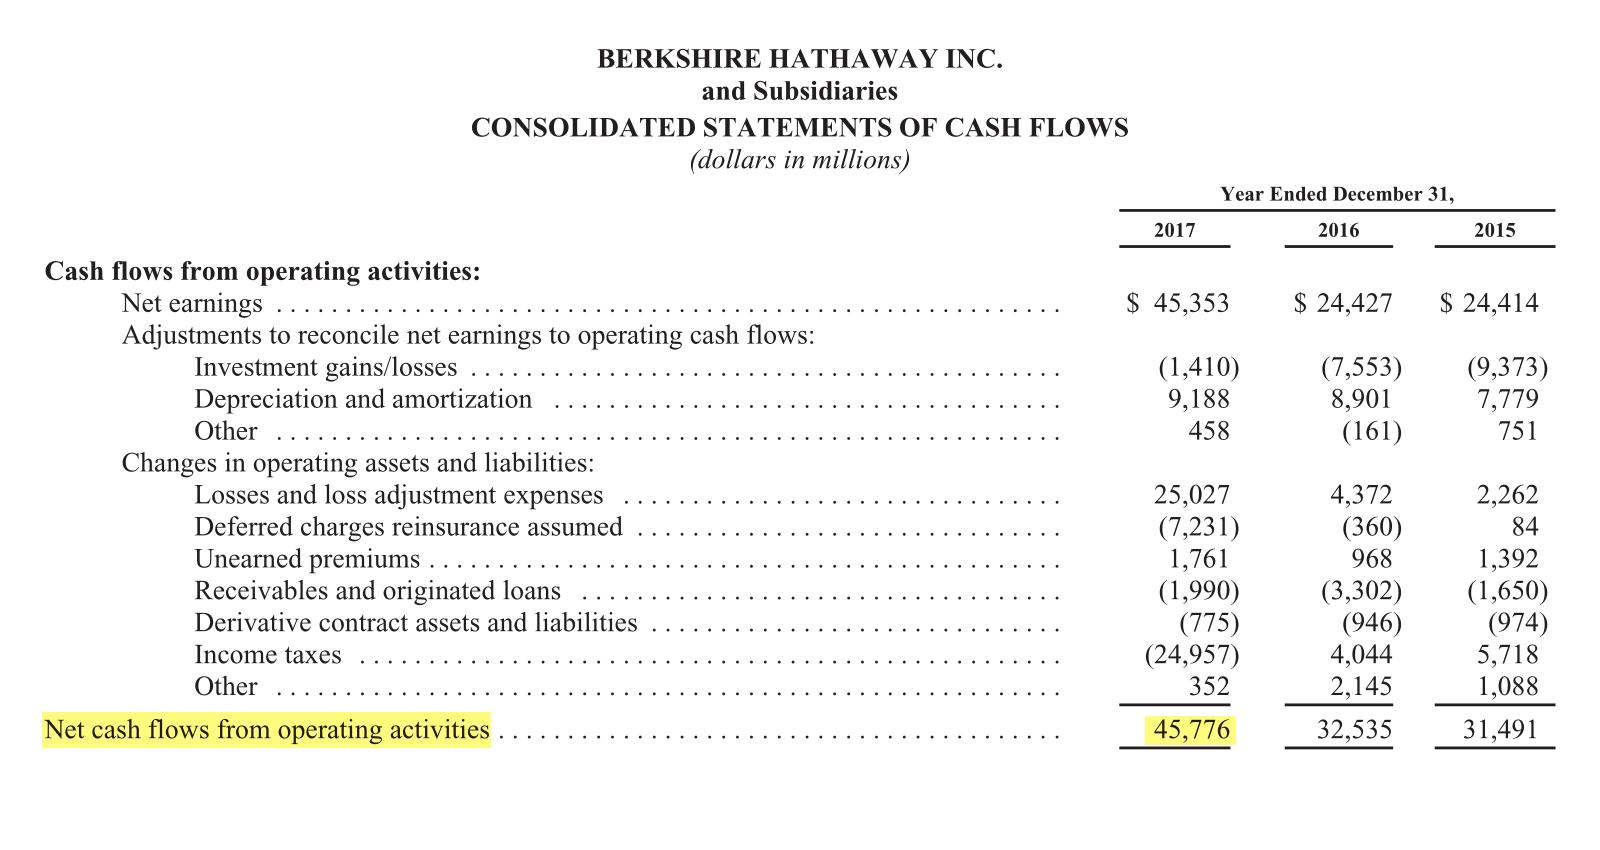 Страница 98 отчета Berkshire Hathaway за 2017 год